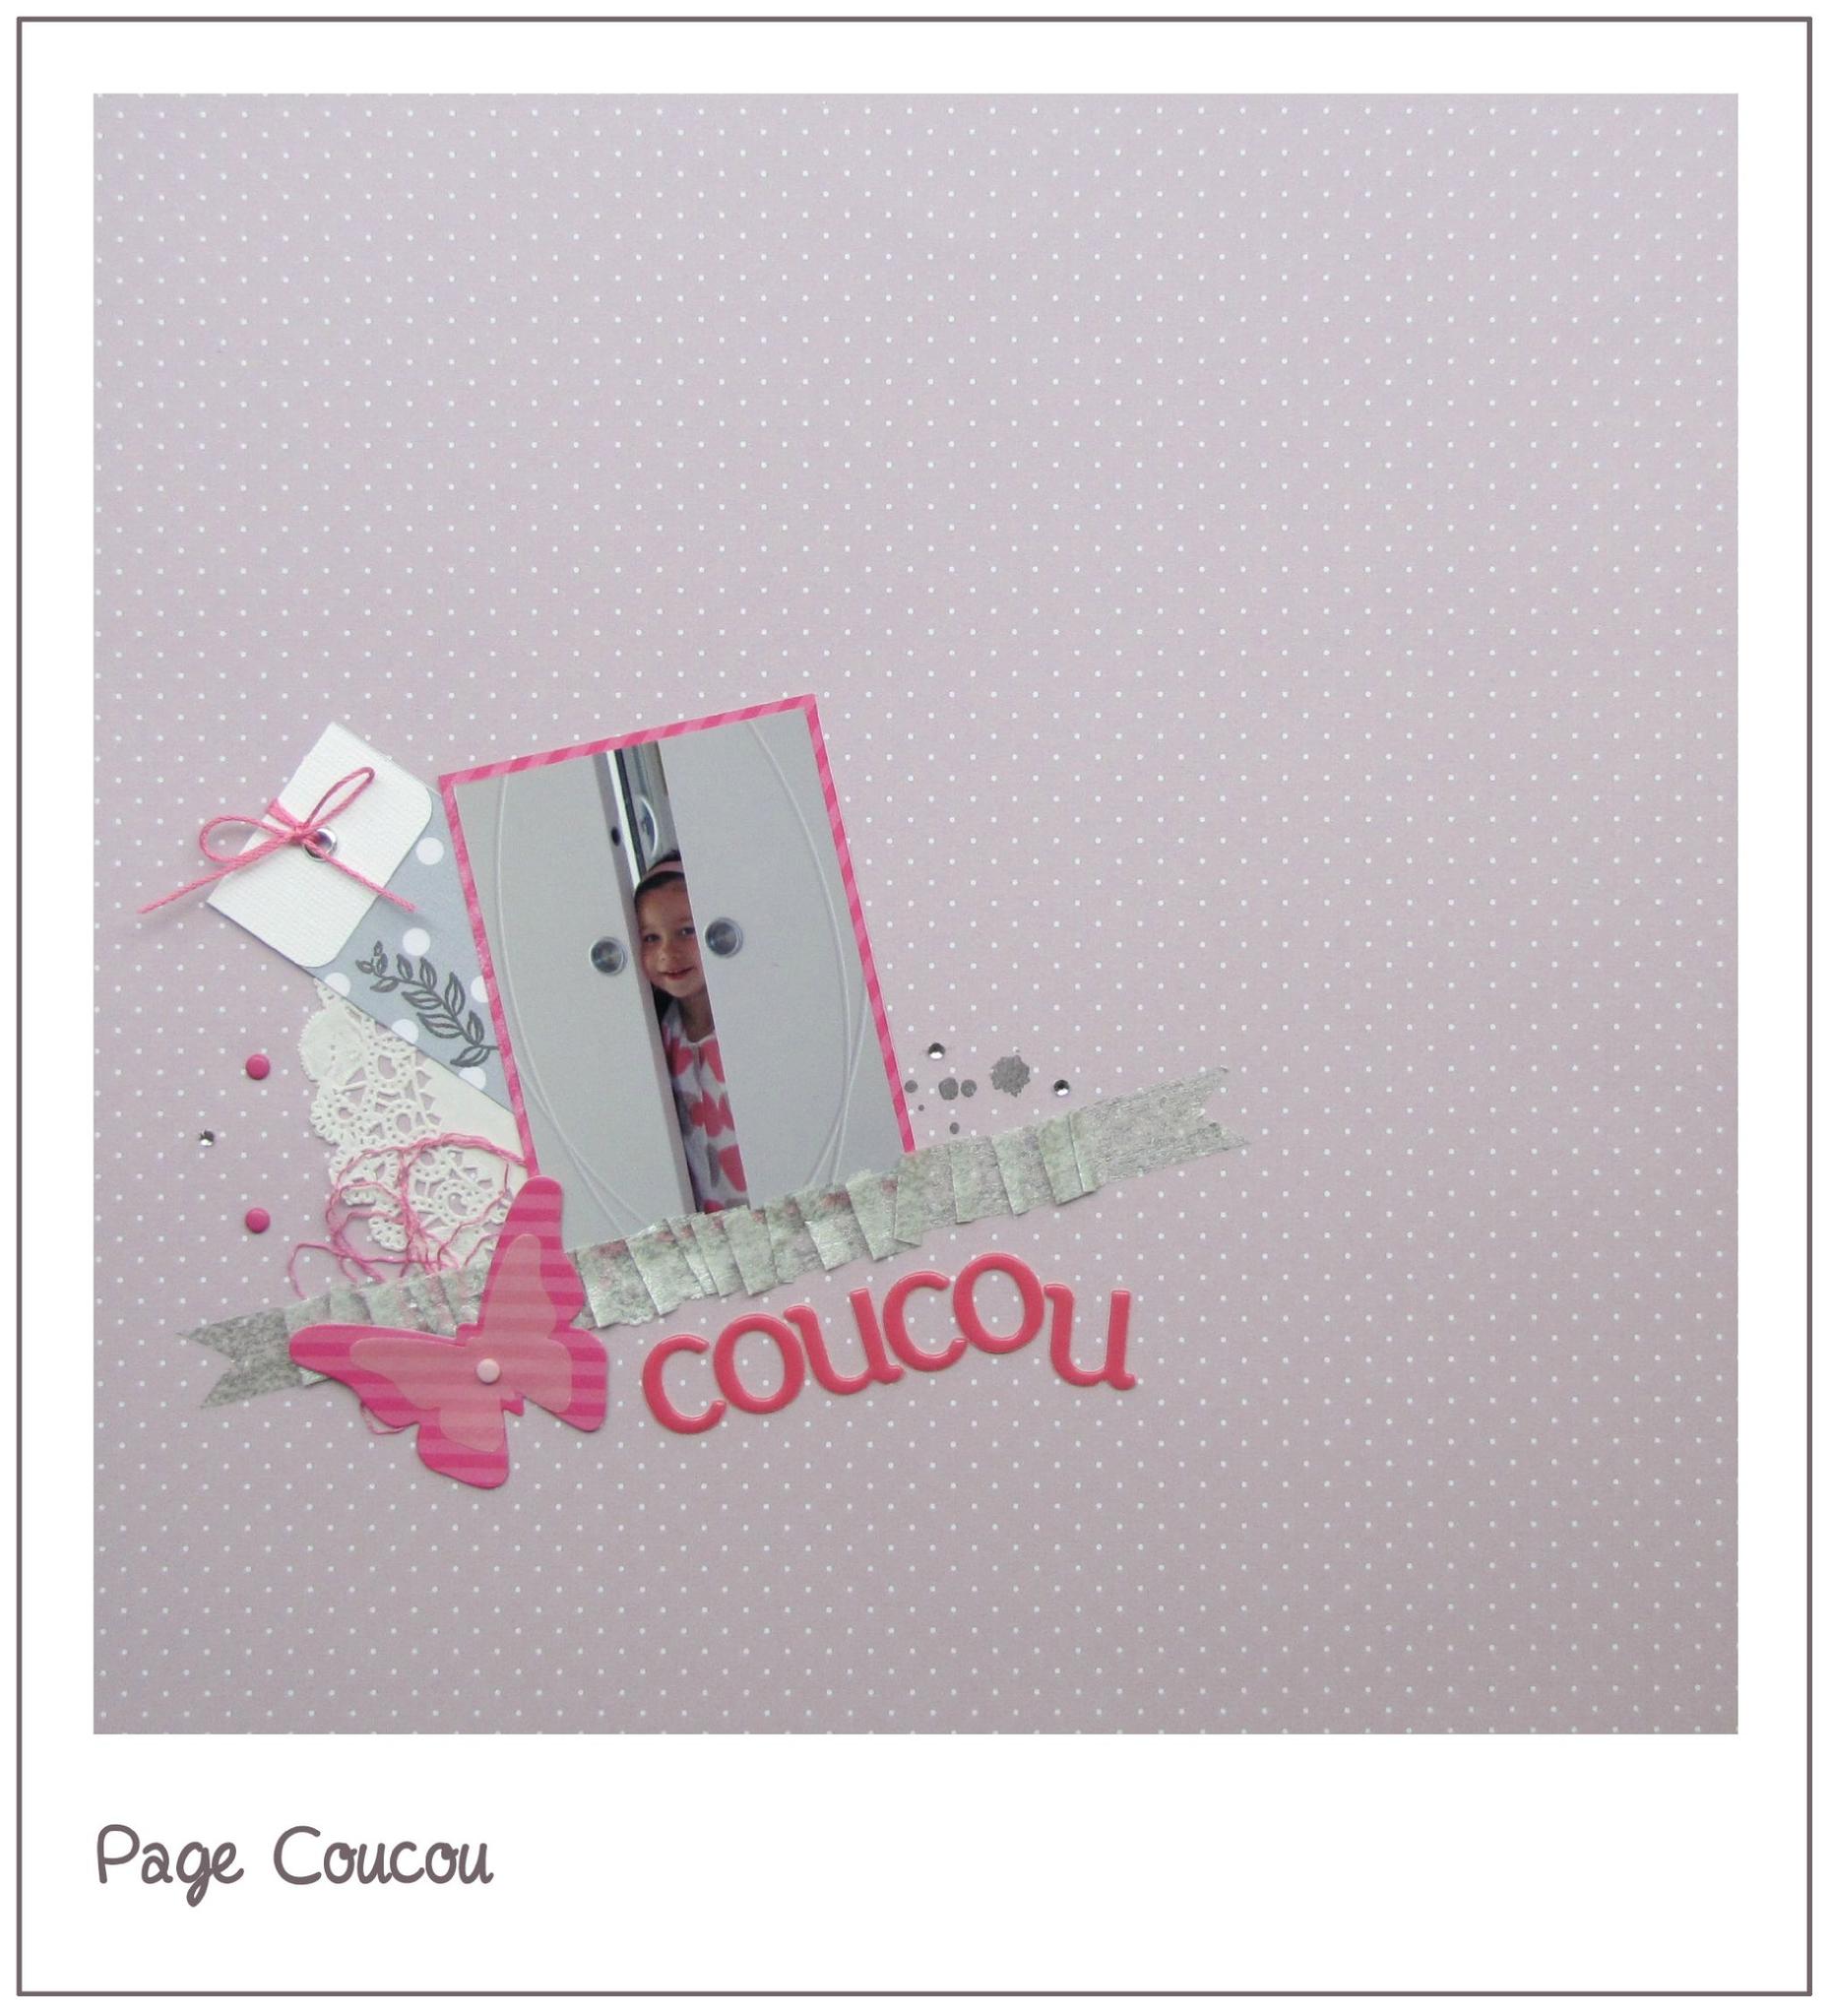 31 - 010712 - Coucou